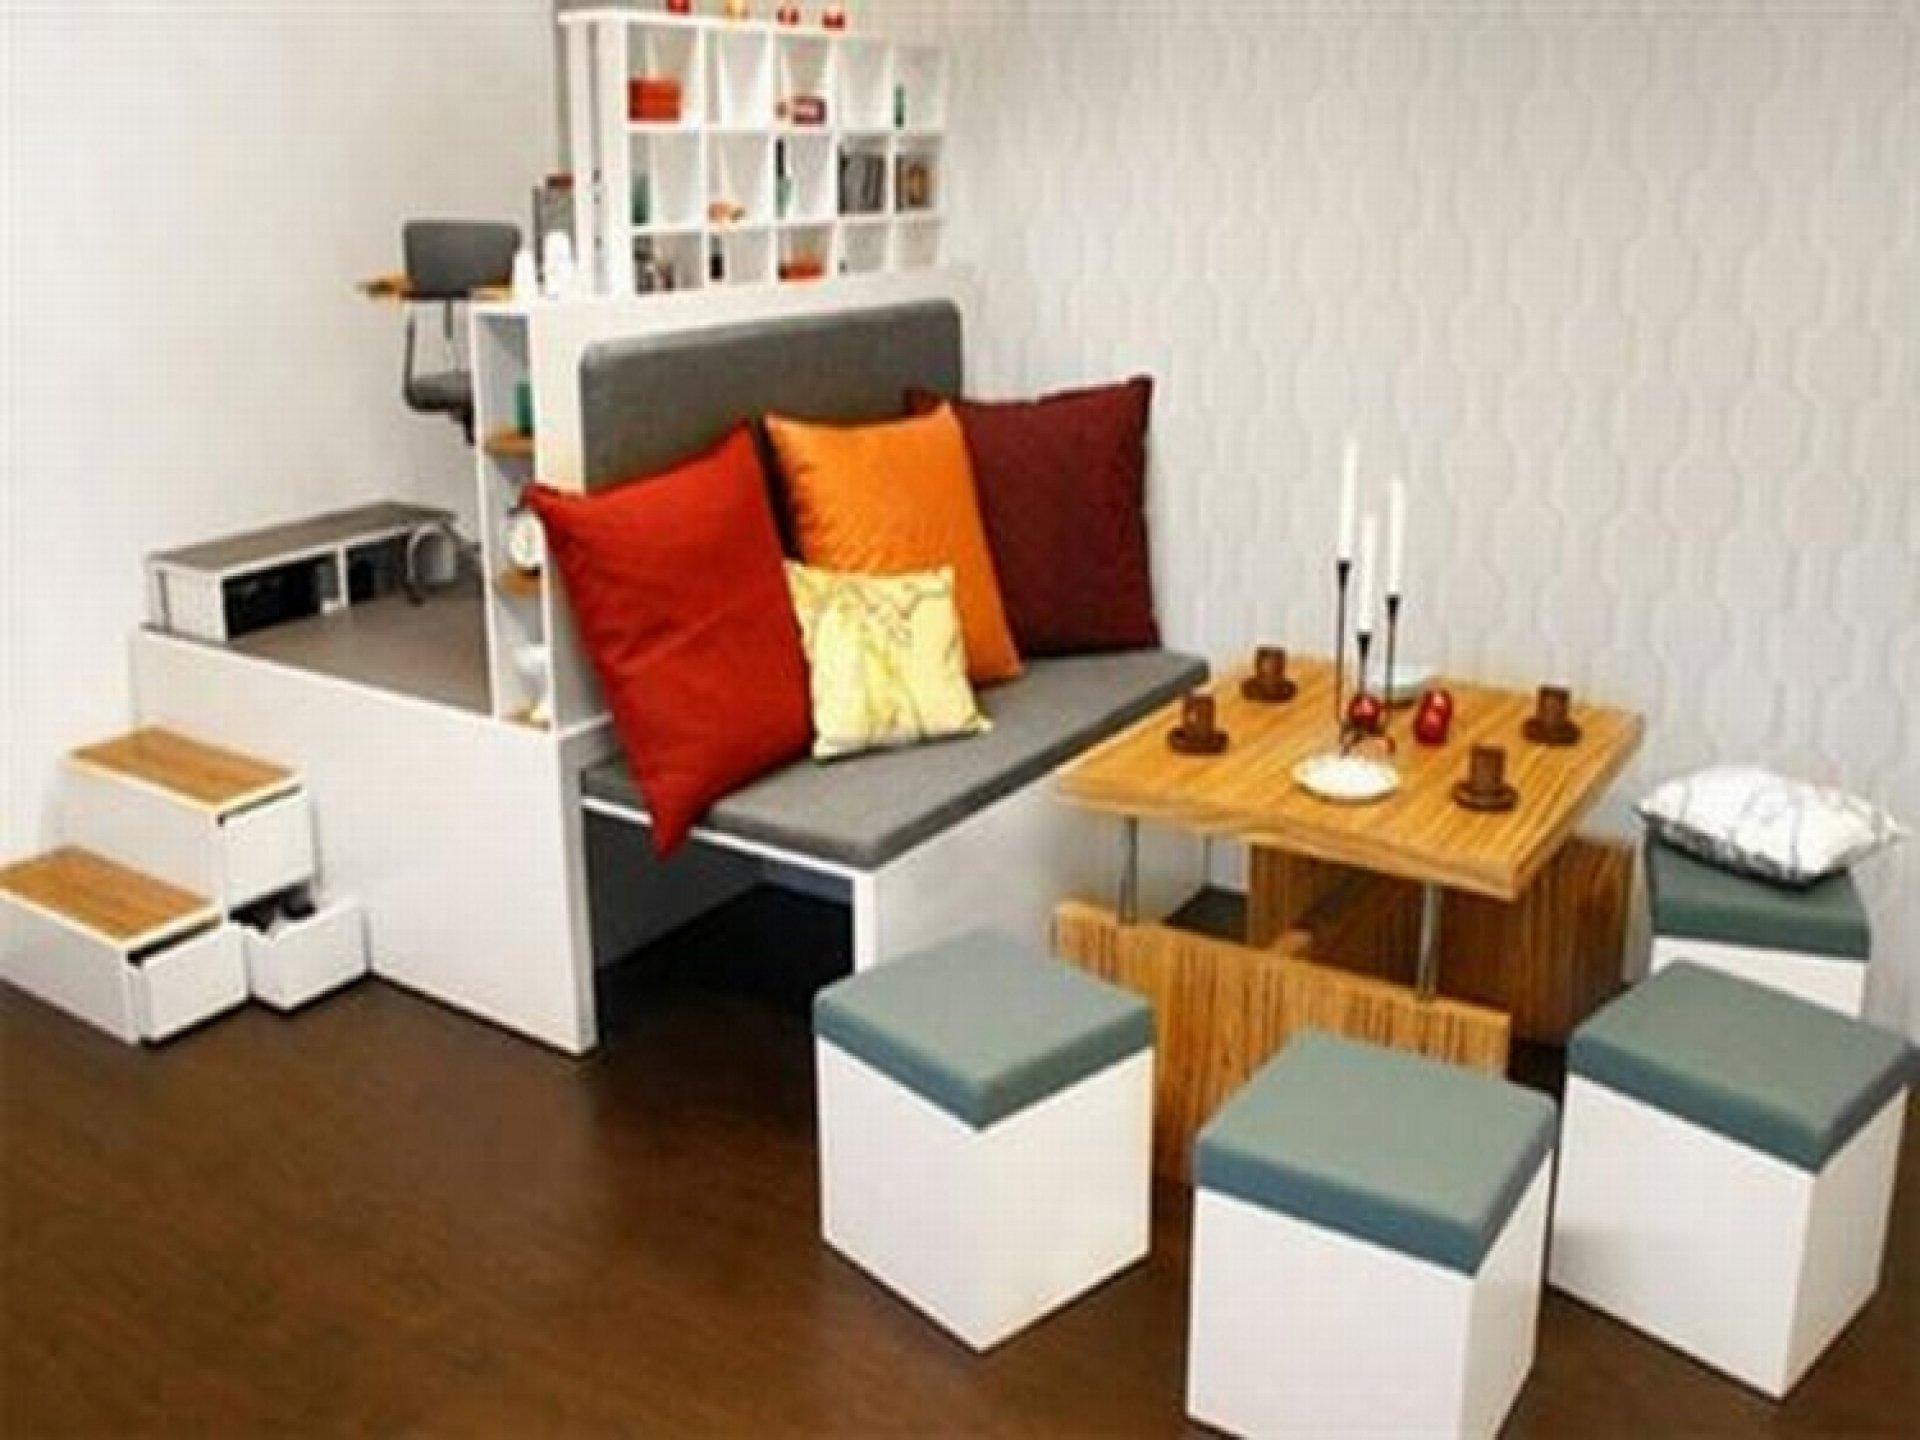 10 Gorgeous Interior Design Ideas For Small Spaces fresh interior decor ideas for small spaces 57 on designing design